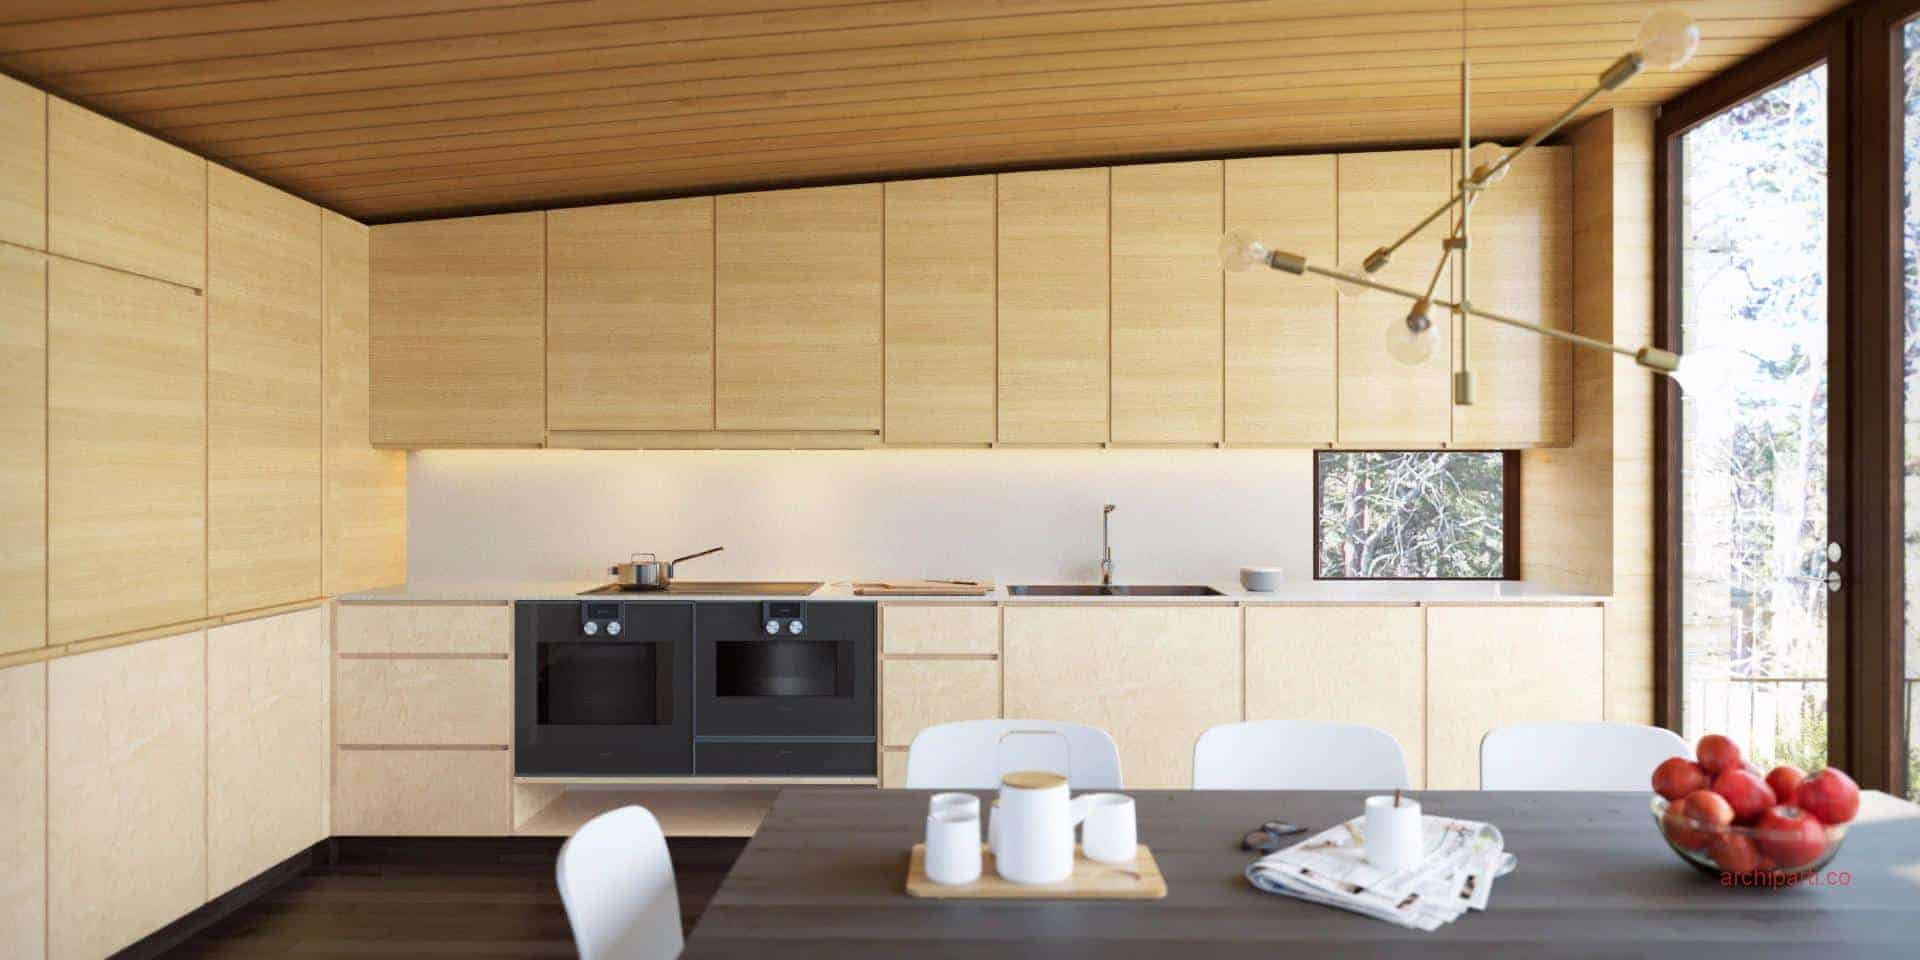 kitchen builder app update ideas 中西双厨 最厉害的现代厨房设计装修 你知道这23个秘密吗 公寓厨房设计